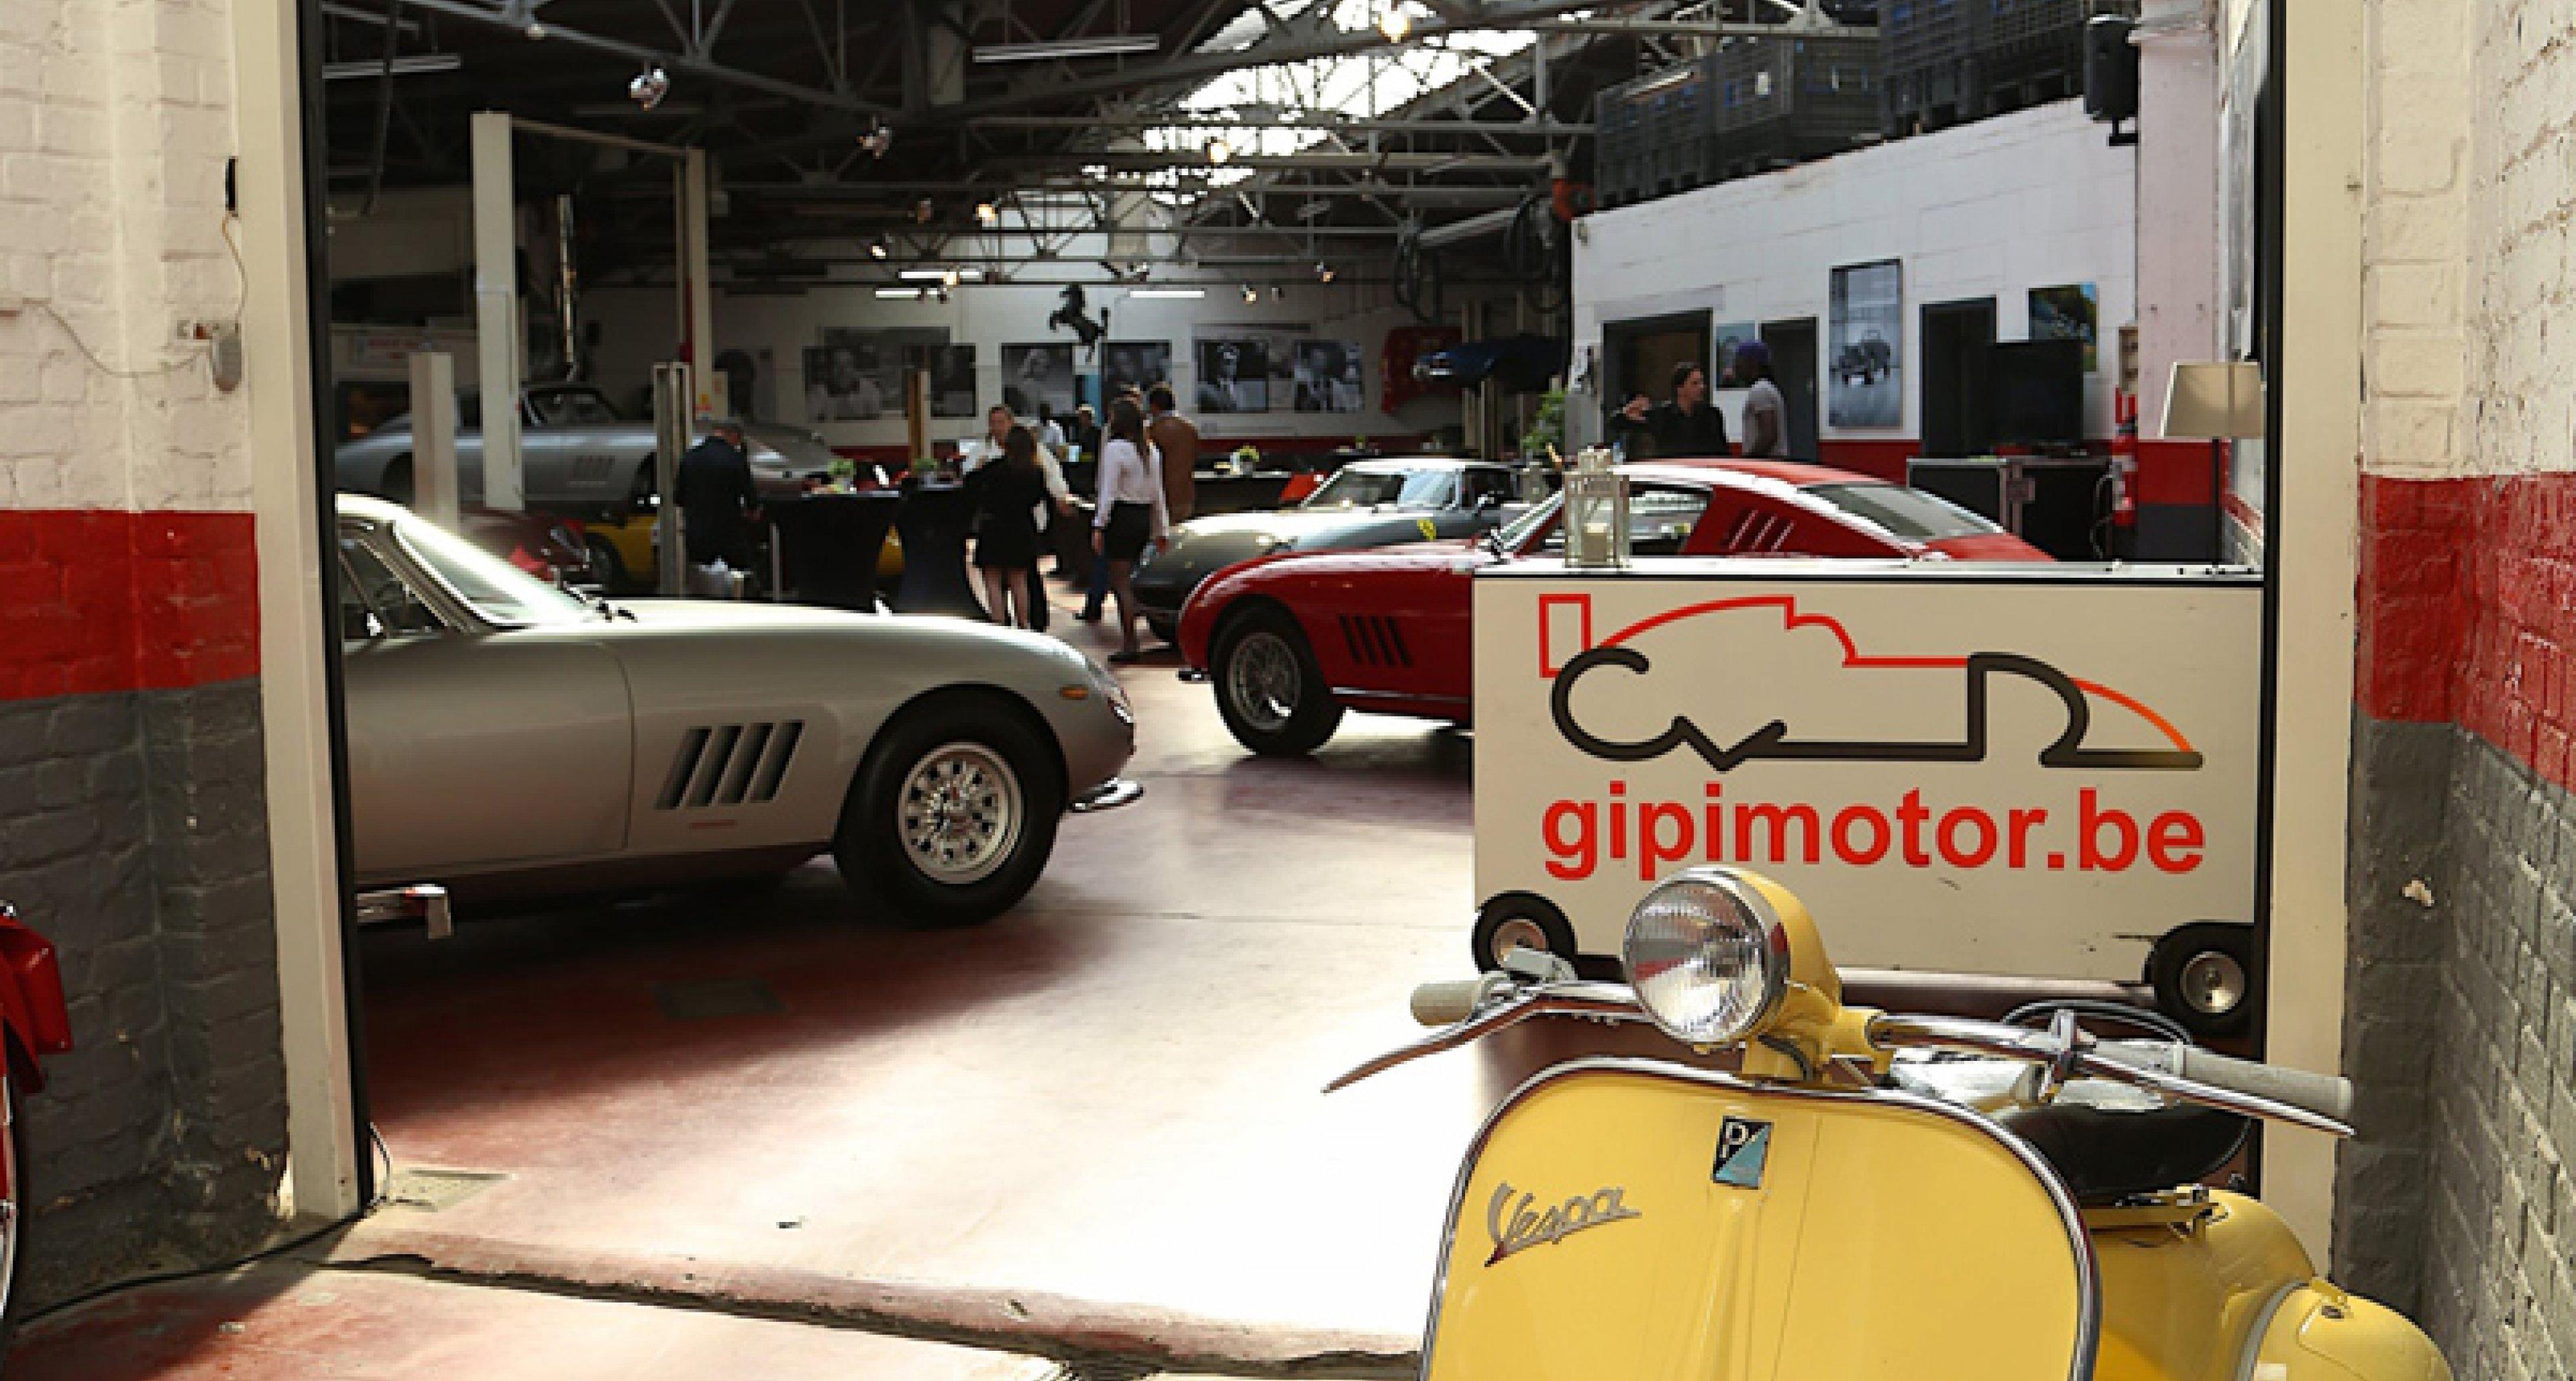 Gipimotor - Ferrari 275 50th Anniversary